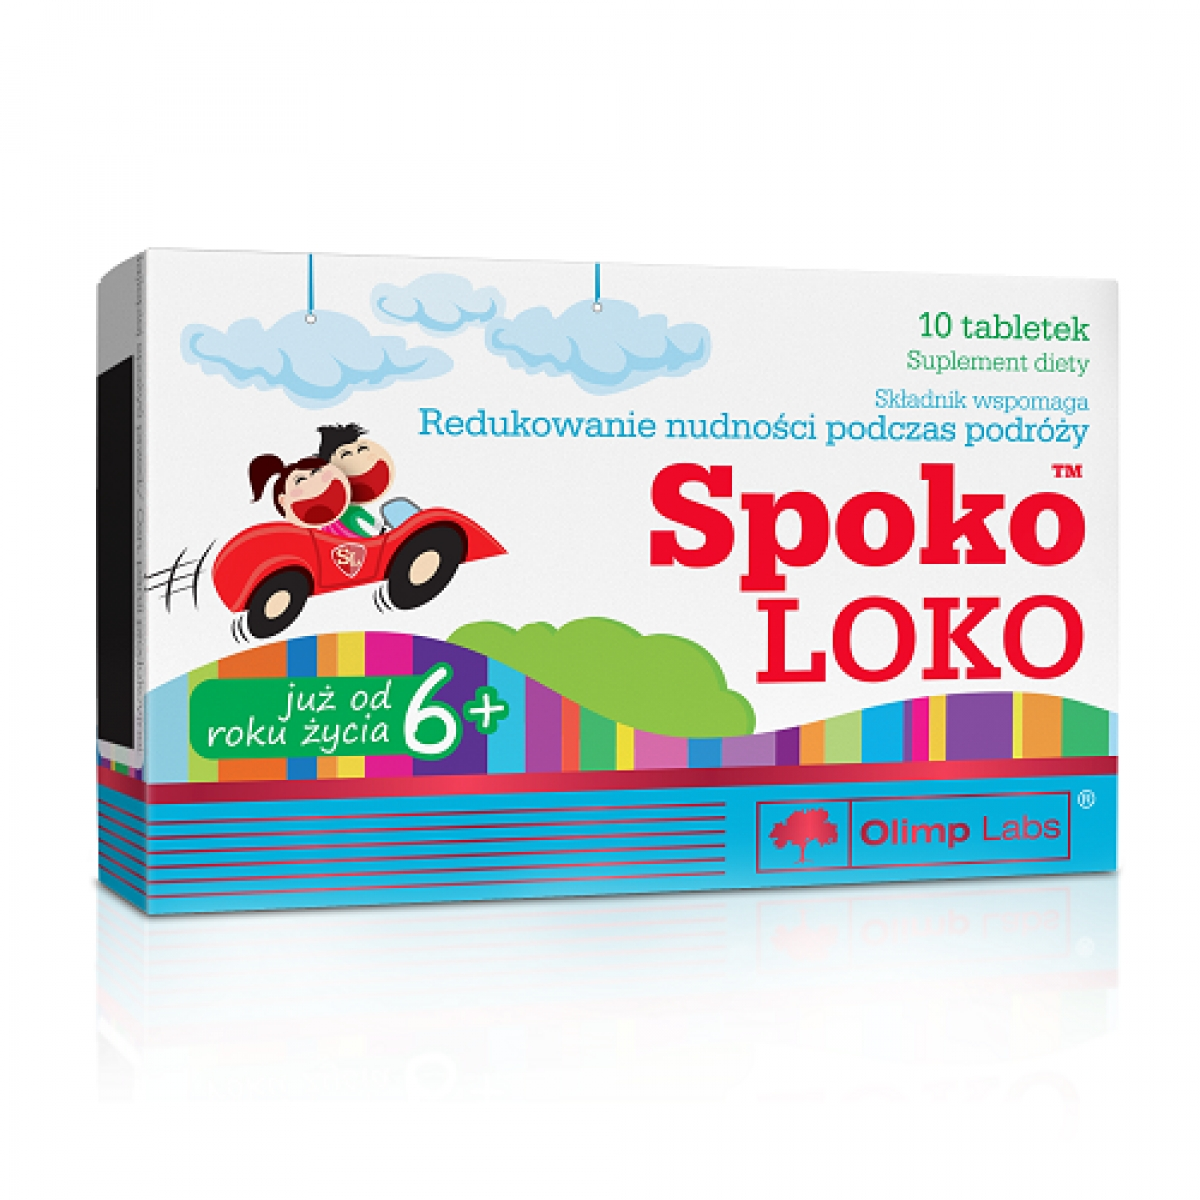 SPOKO LOKO, 10 TABLETS